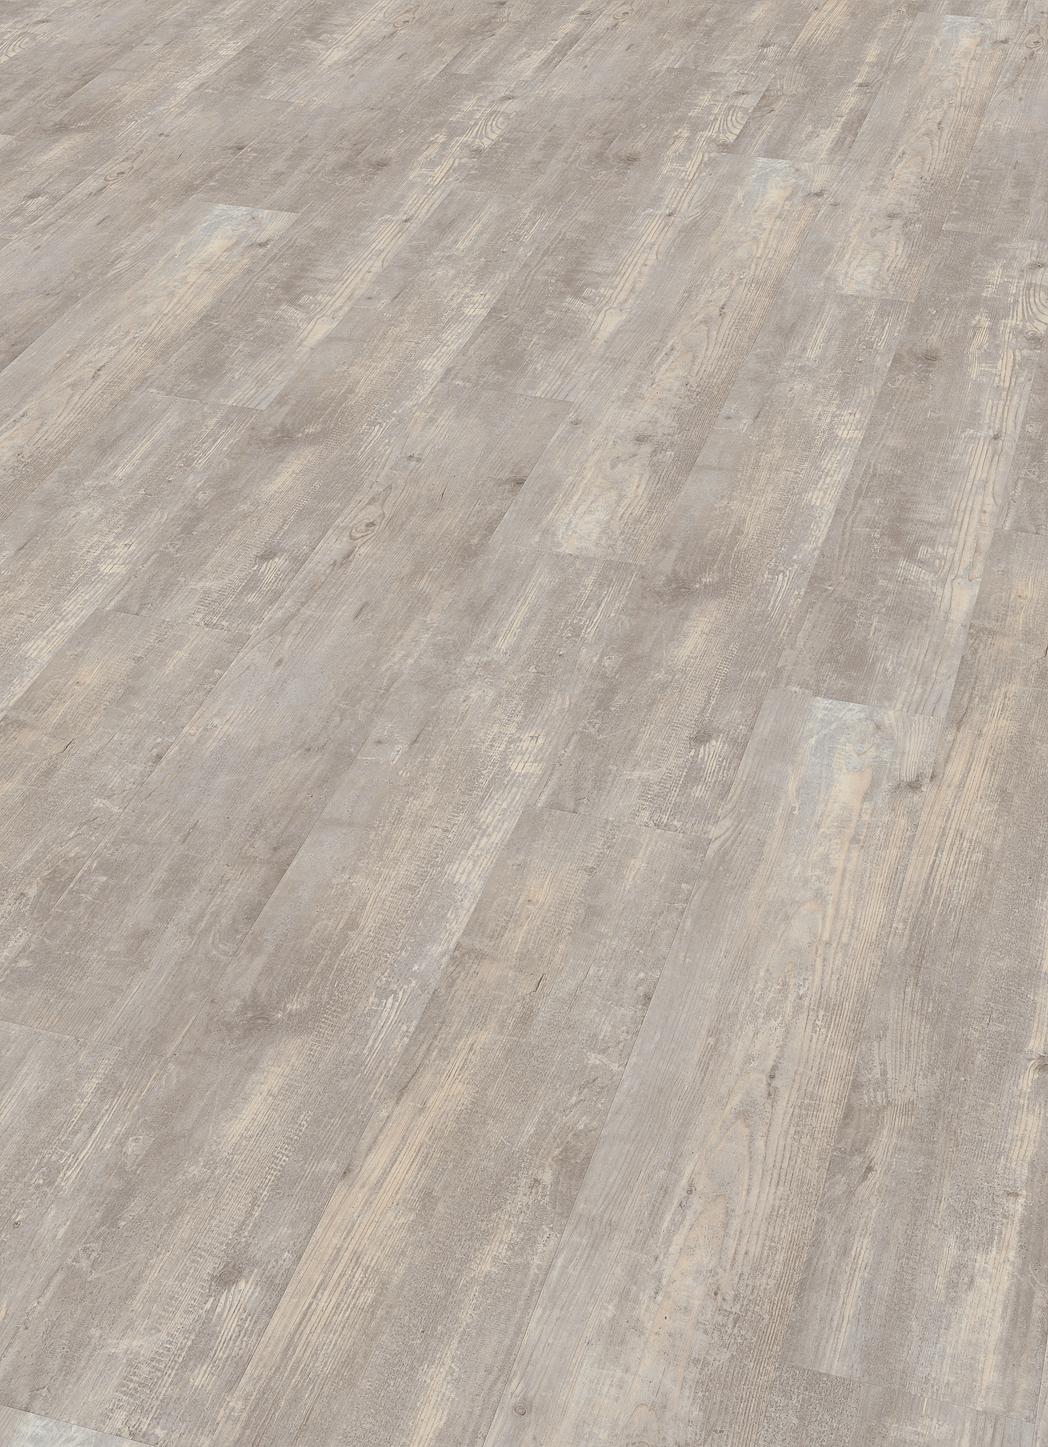 LVF900 Luxury Vinyl Plank Pine Malmö Grey Wood4Floors